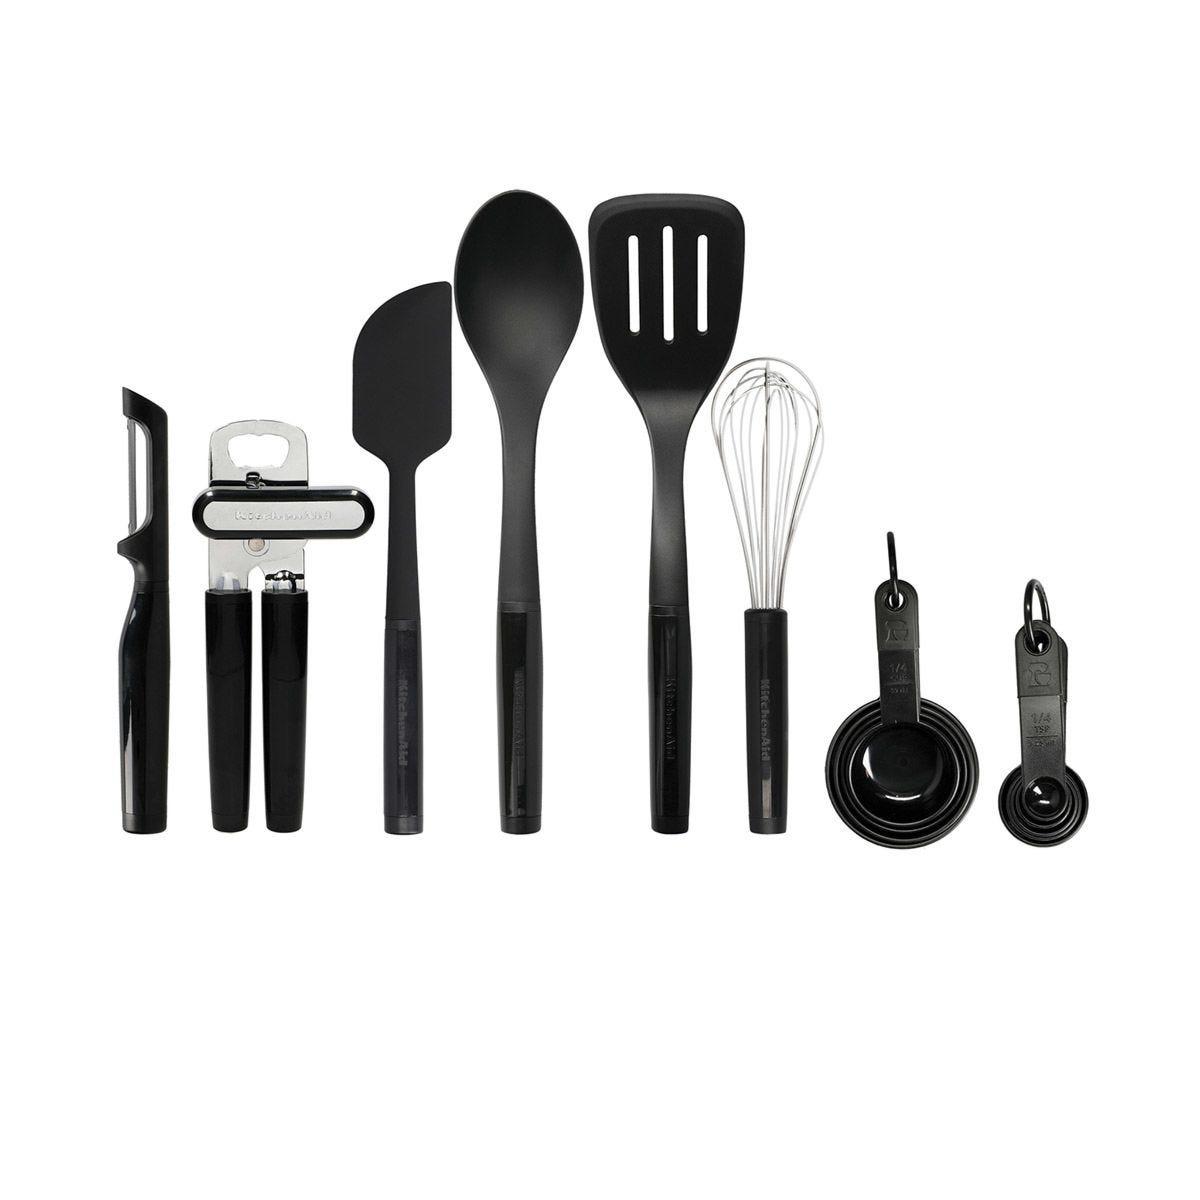 KitchenAid Tool and Gadget Set of 15 Pieces - Black